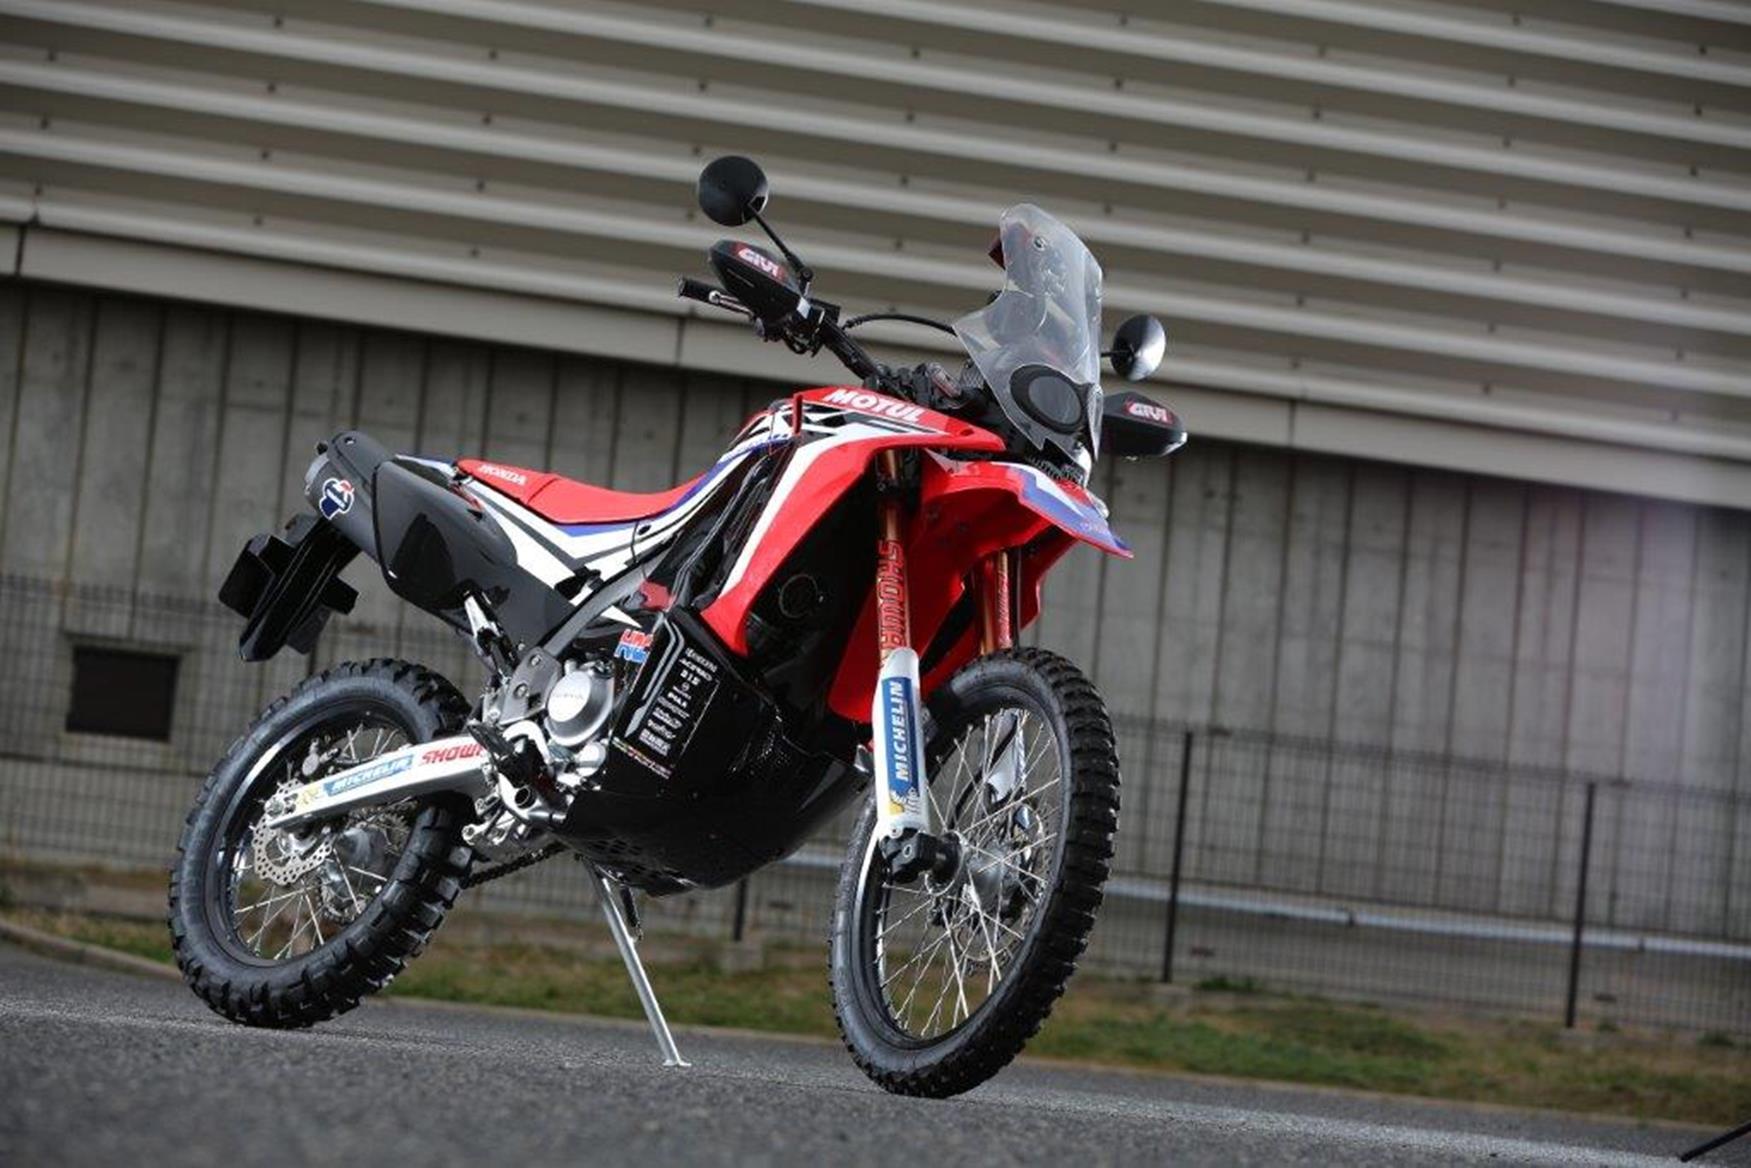 HONDA CRF250 RALLY | Page 3 | Adventure Rider